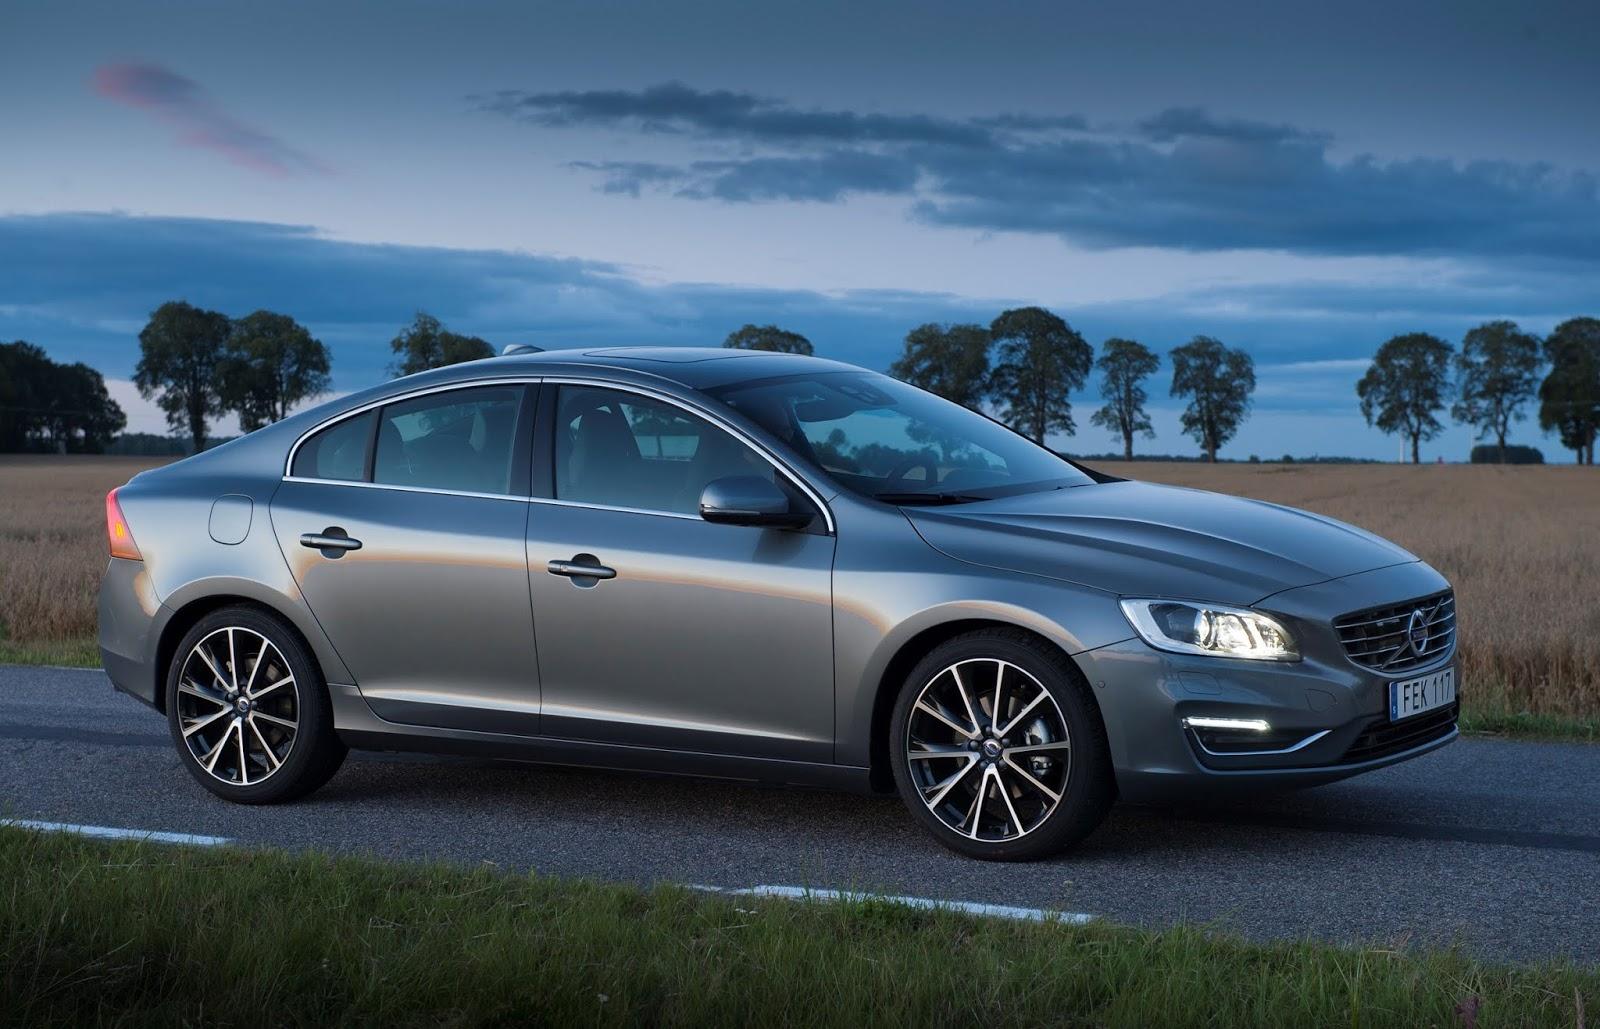 167518 Volvo S60 model year 2016 Προσφορά ως τις 30 Ιουνίου για τα Volvo S60 και V60 Volvo, Volvo S60, Volvo V60